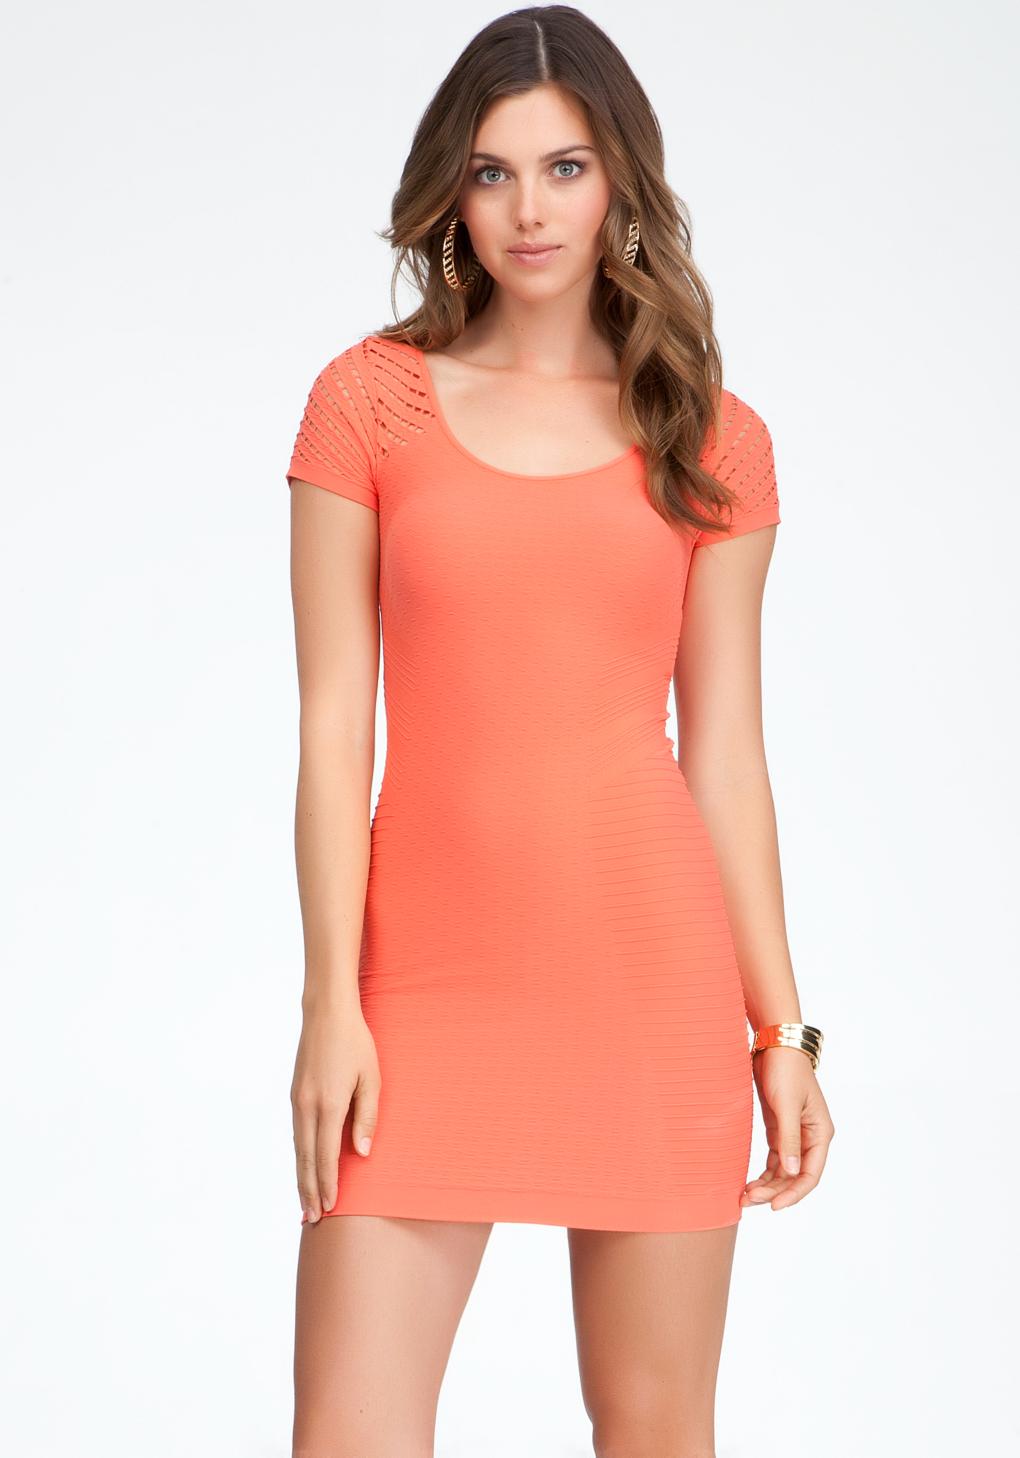 Bebe Diamond Cutout Bodycon Dress In Orange Hot Coral Lyst